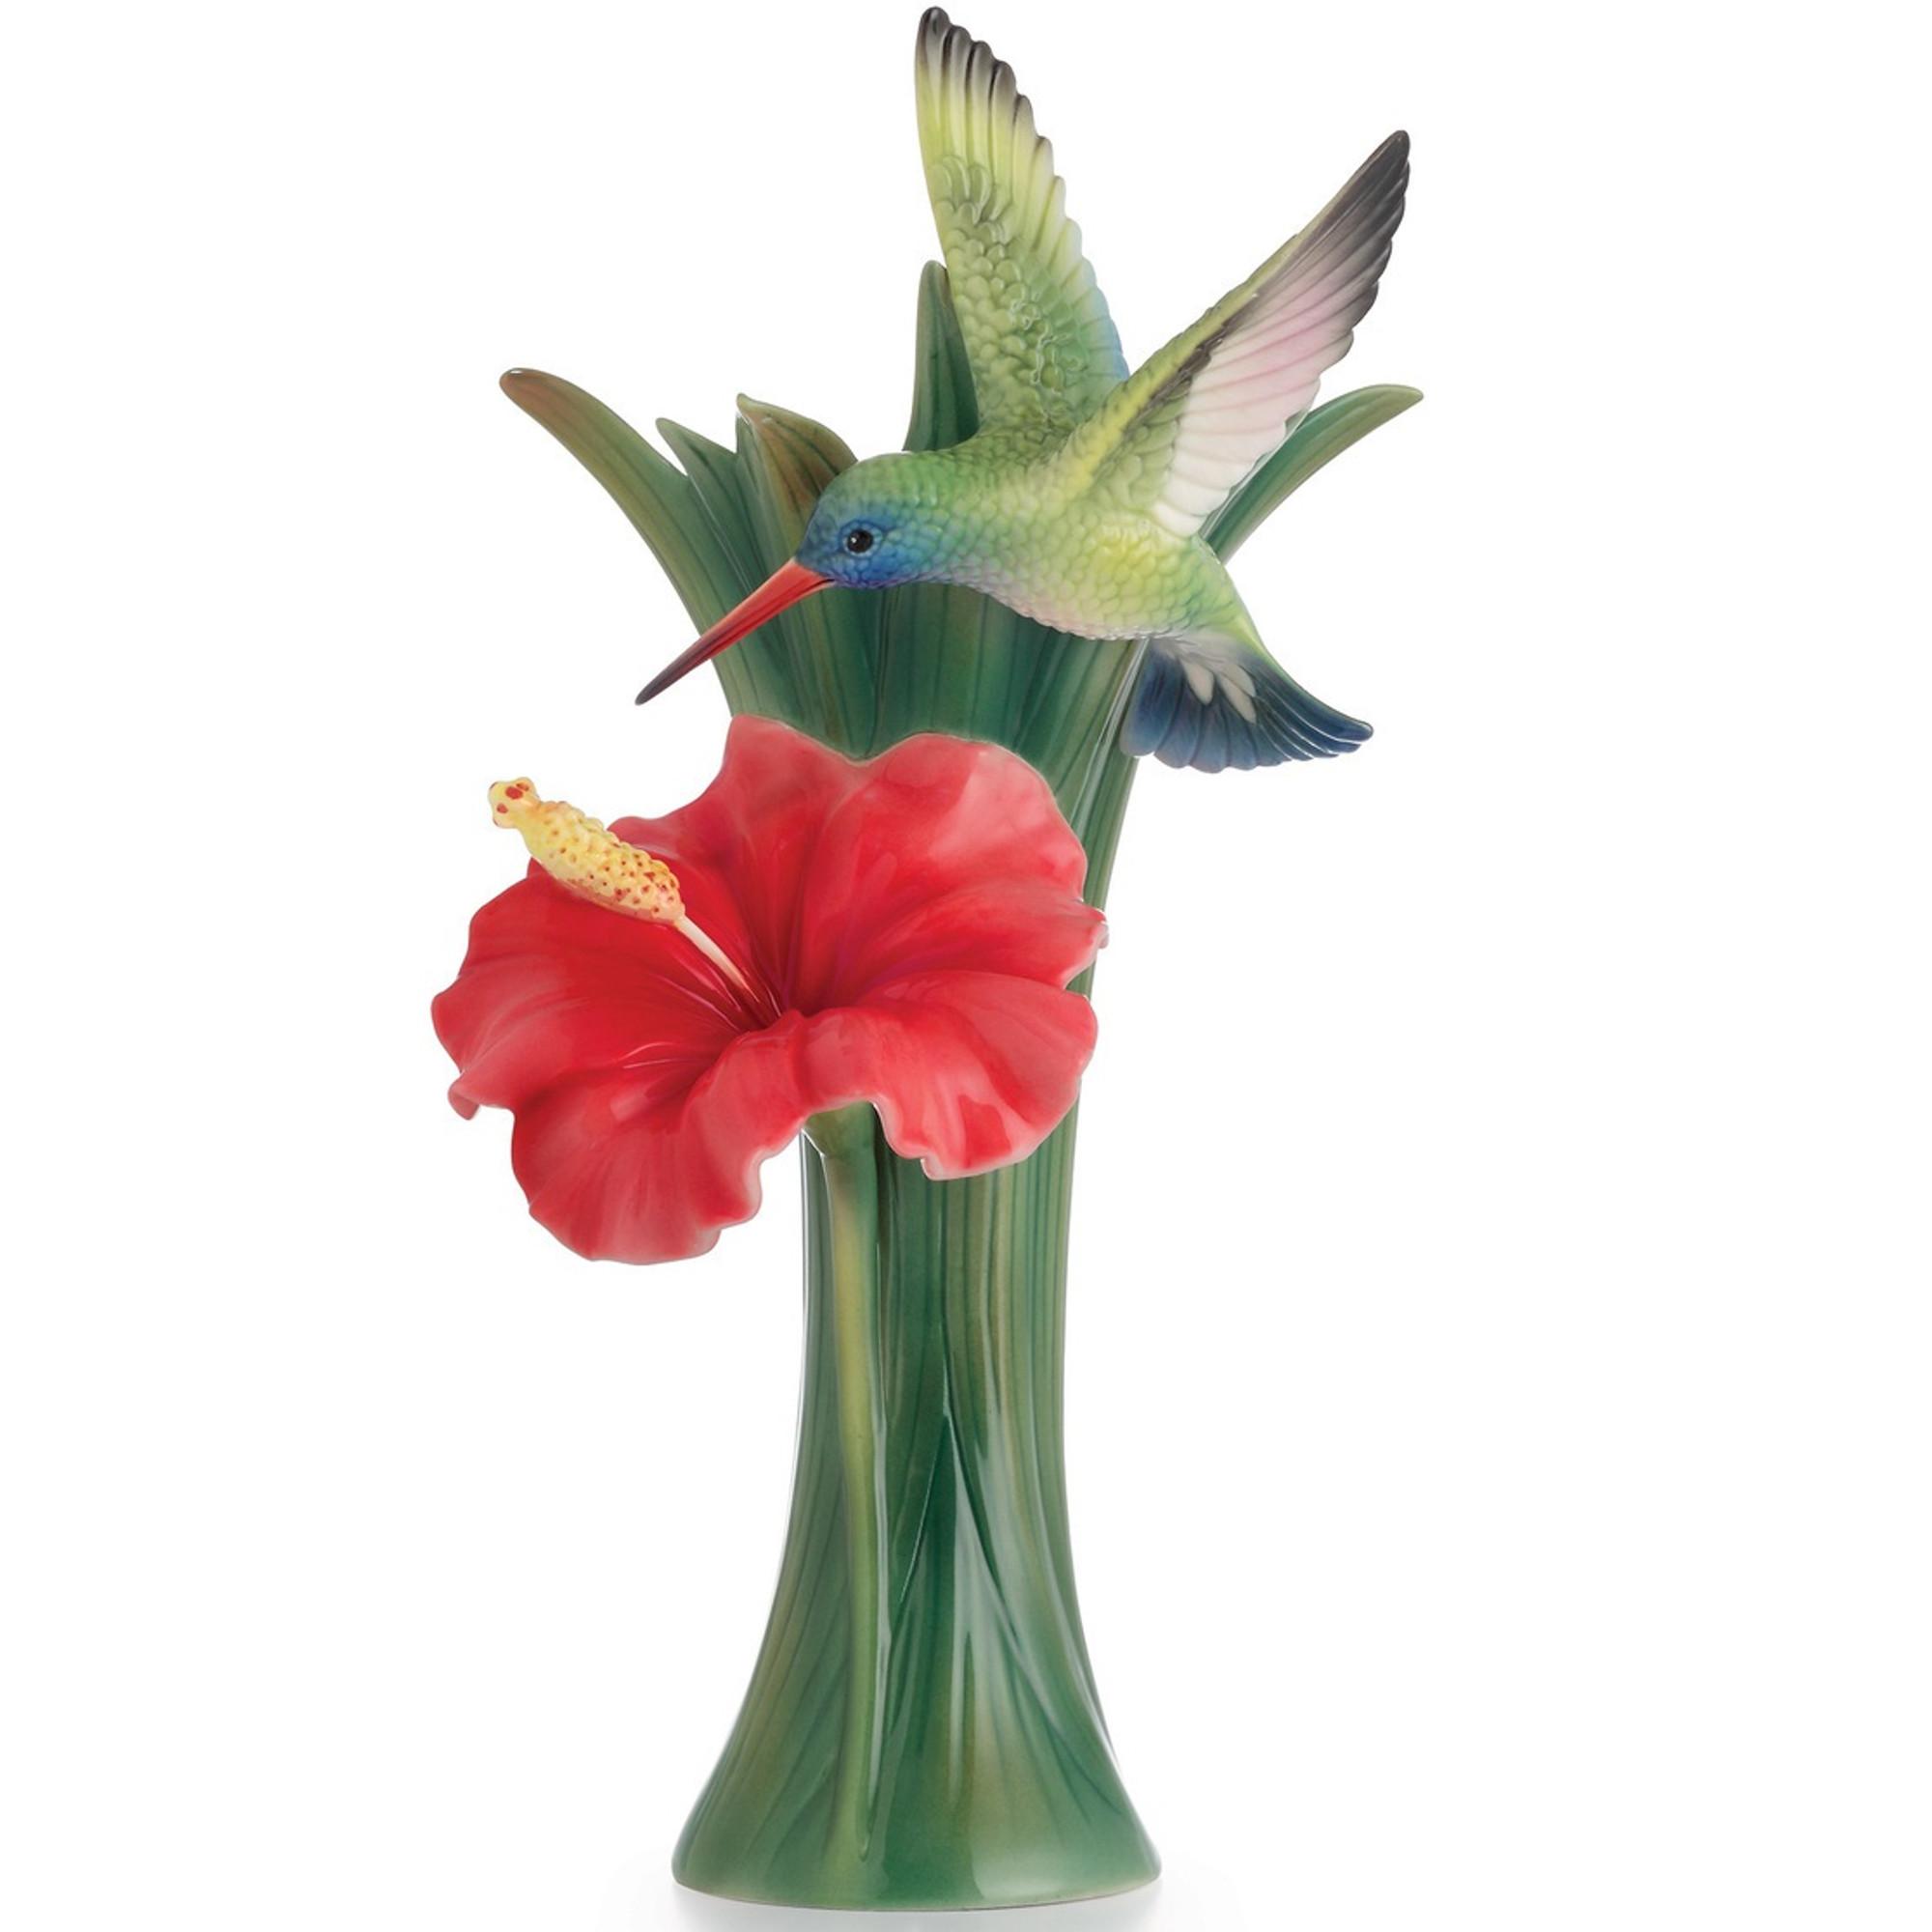 Hummingbird vase hibiscus porcelain franz hummingbird hibiscus vase fz02582 franz porcelain collection reviewsmspy